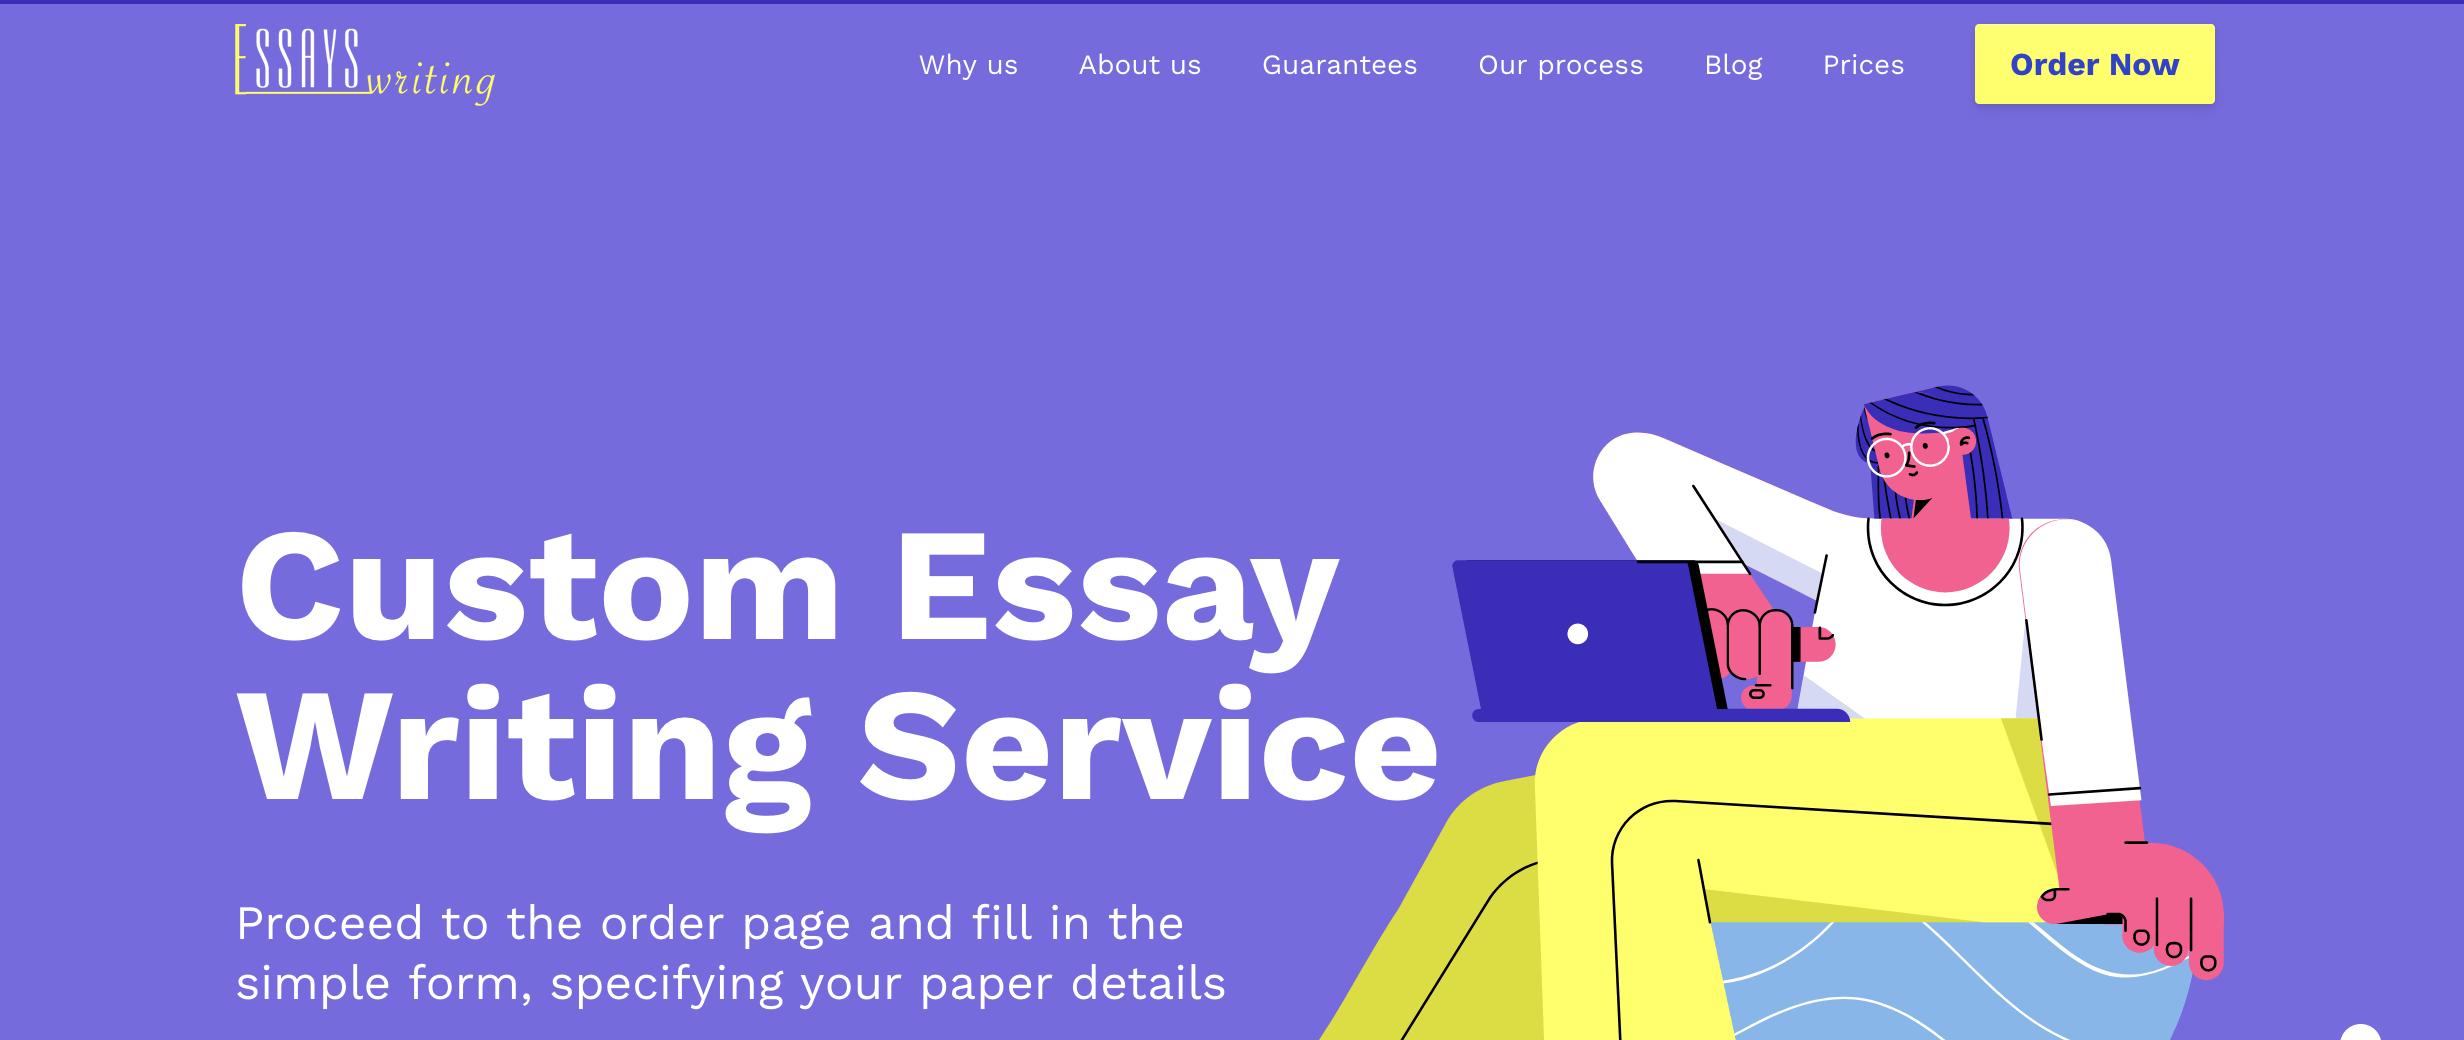 essayswriting.org